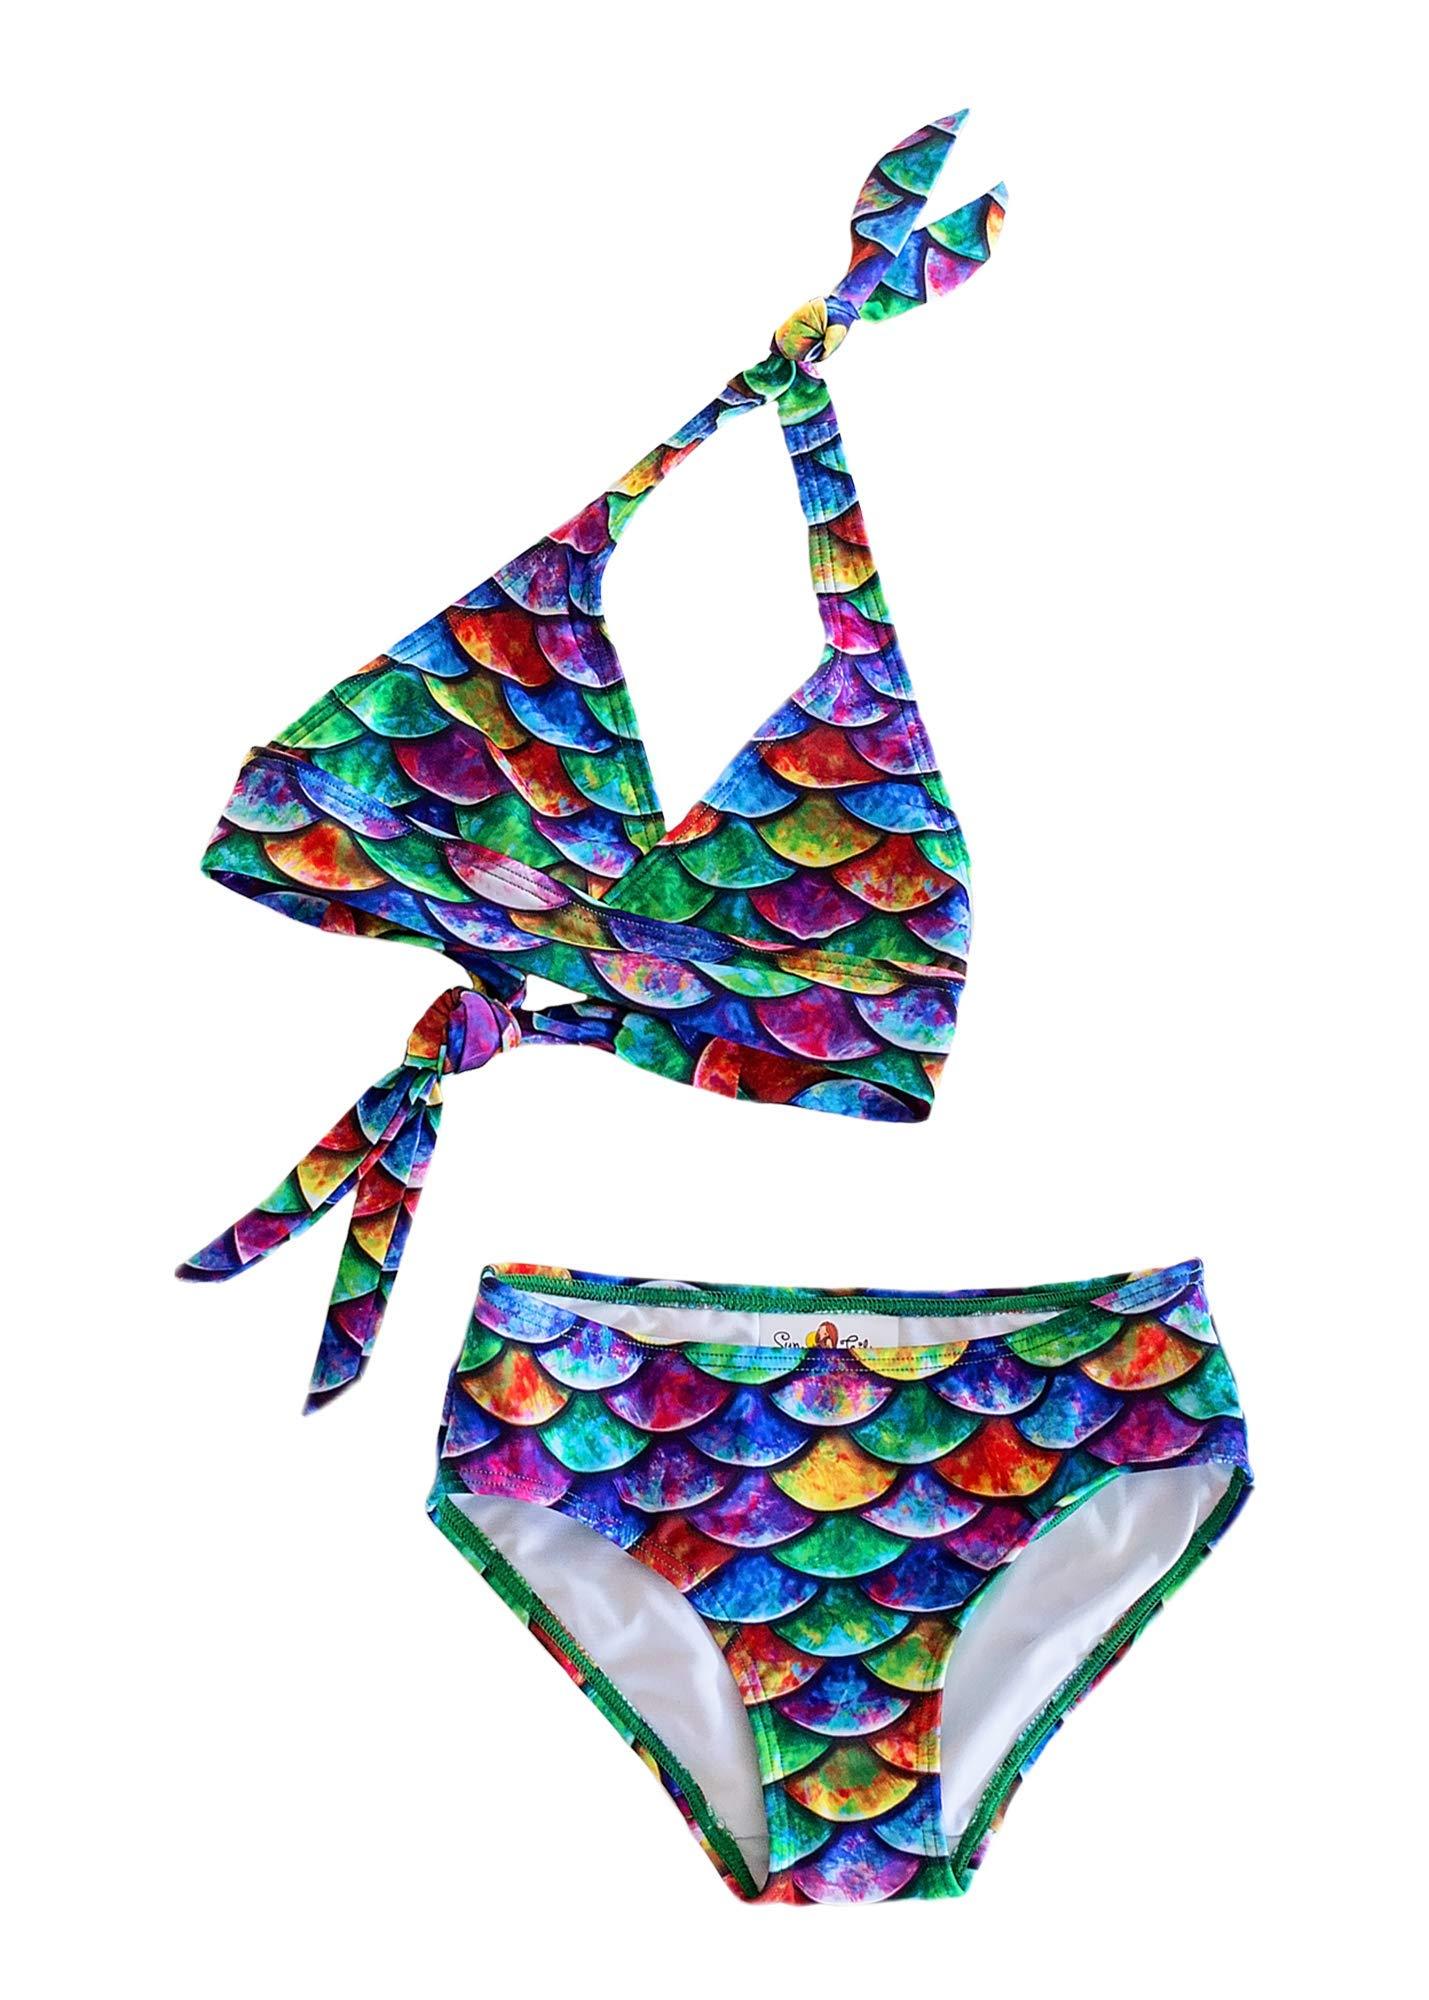 Sun Tails Mermaid Swimsuit - Girls Bikini Set - Matching Scale Colors (8- Teen/Adult L (JL 12-16), Hawaiian Rainbow)